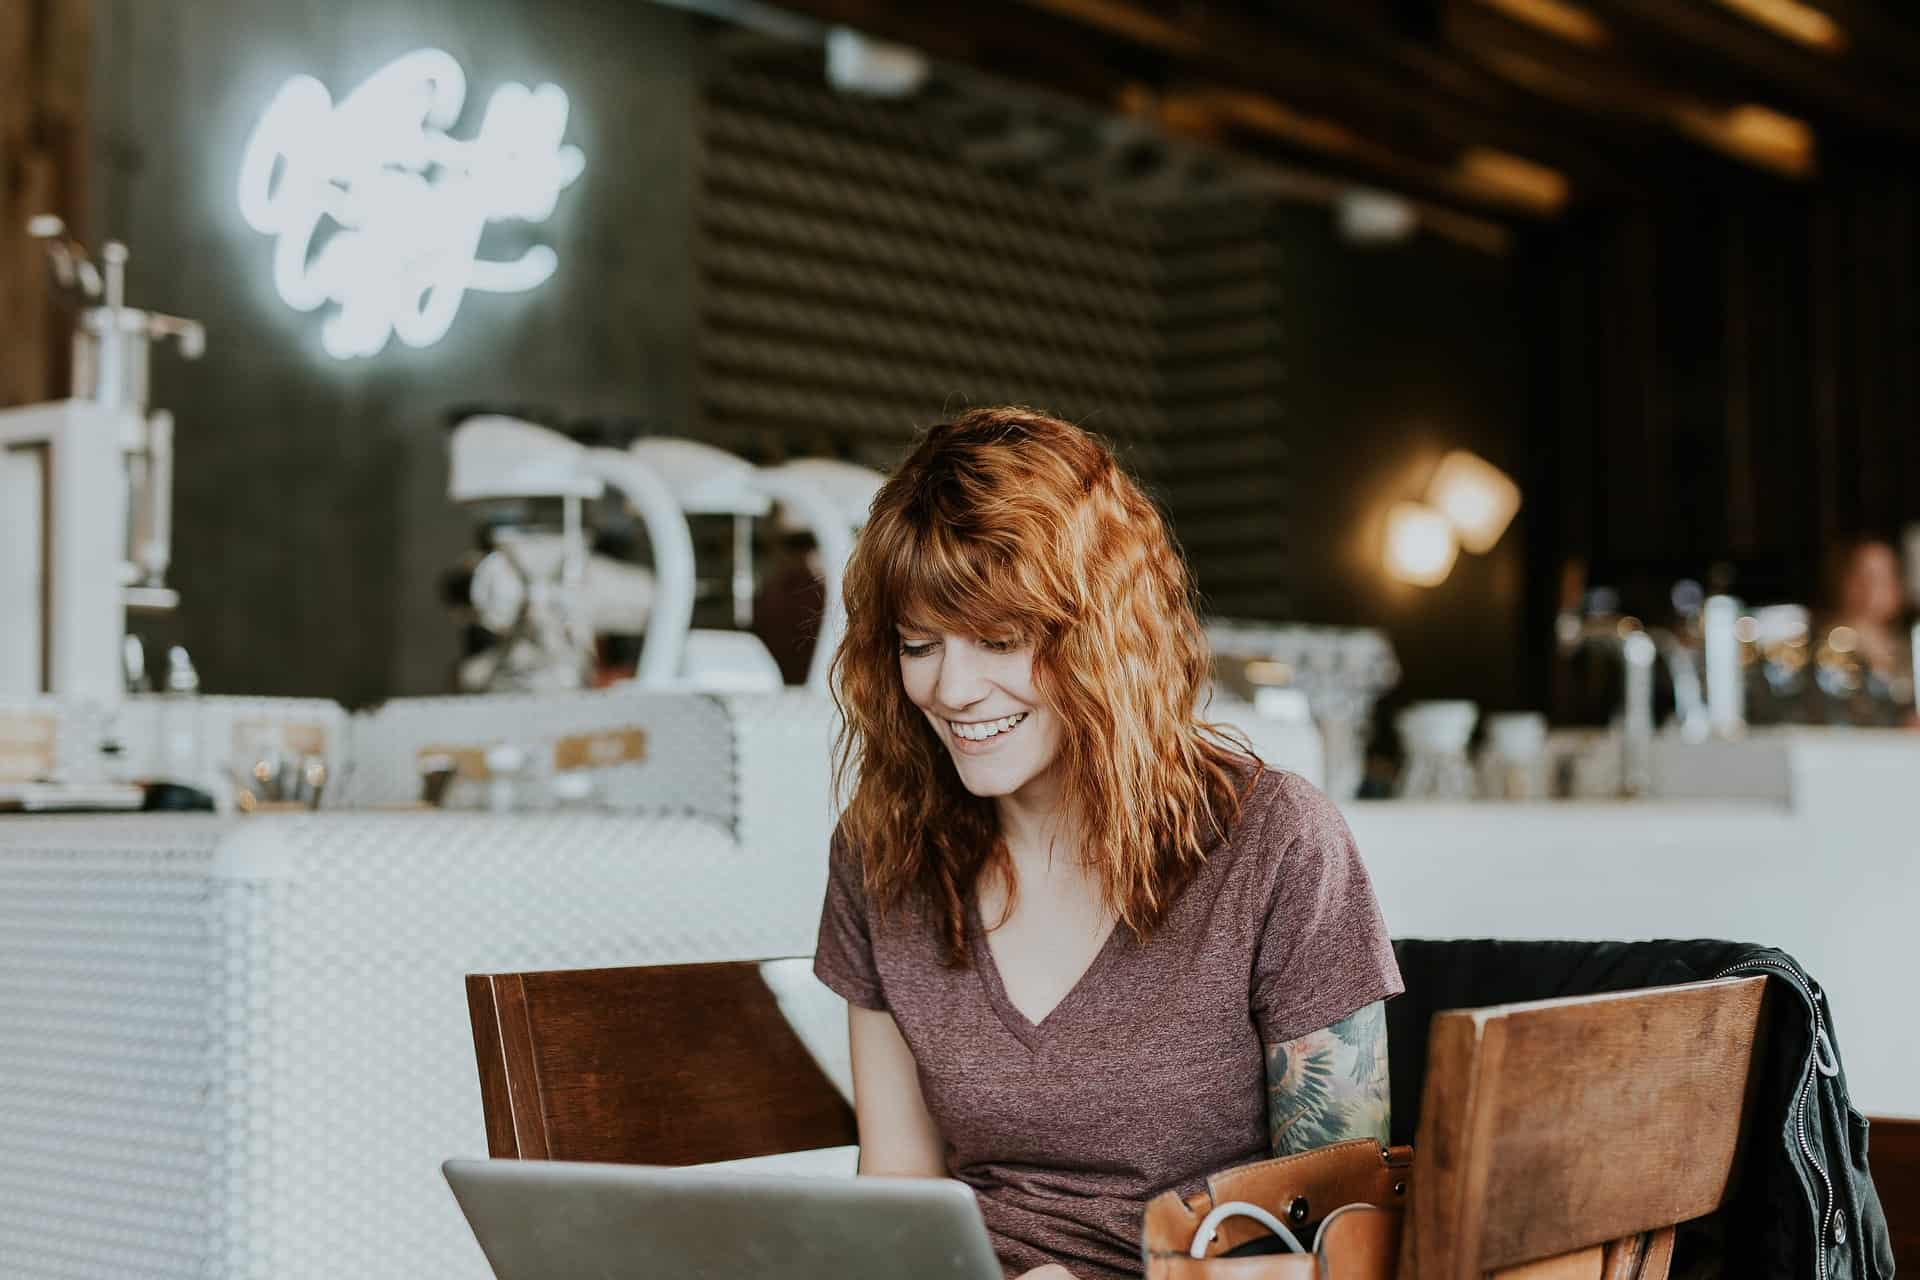 Focus your premium content on solving customer issues